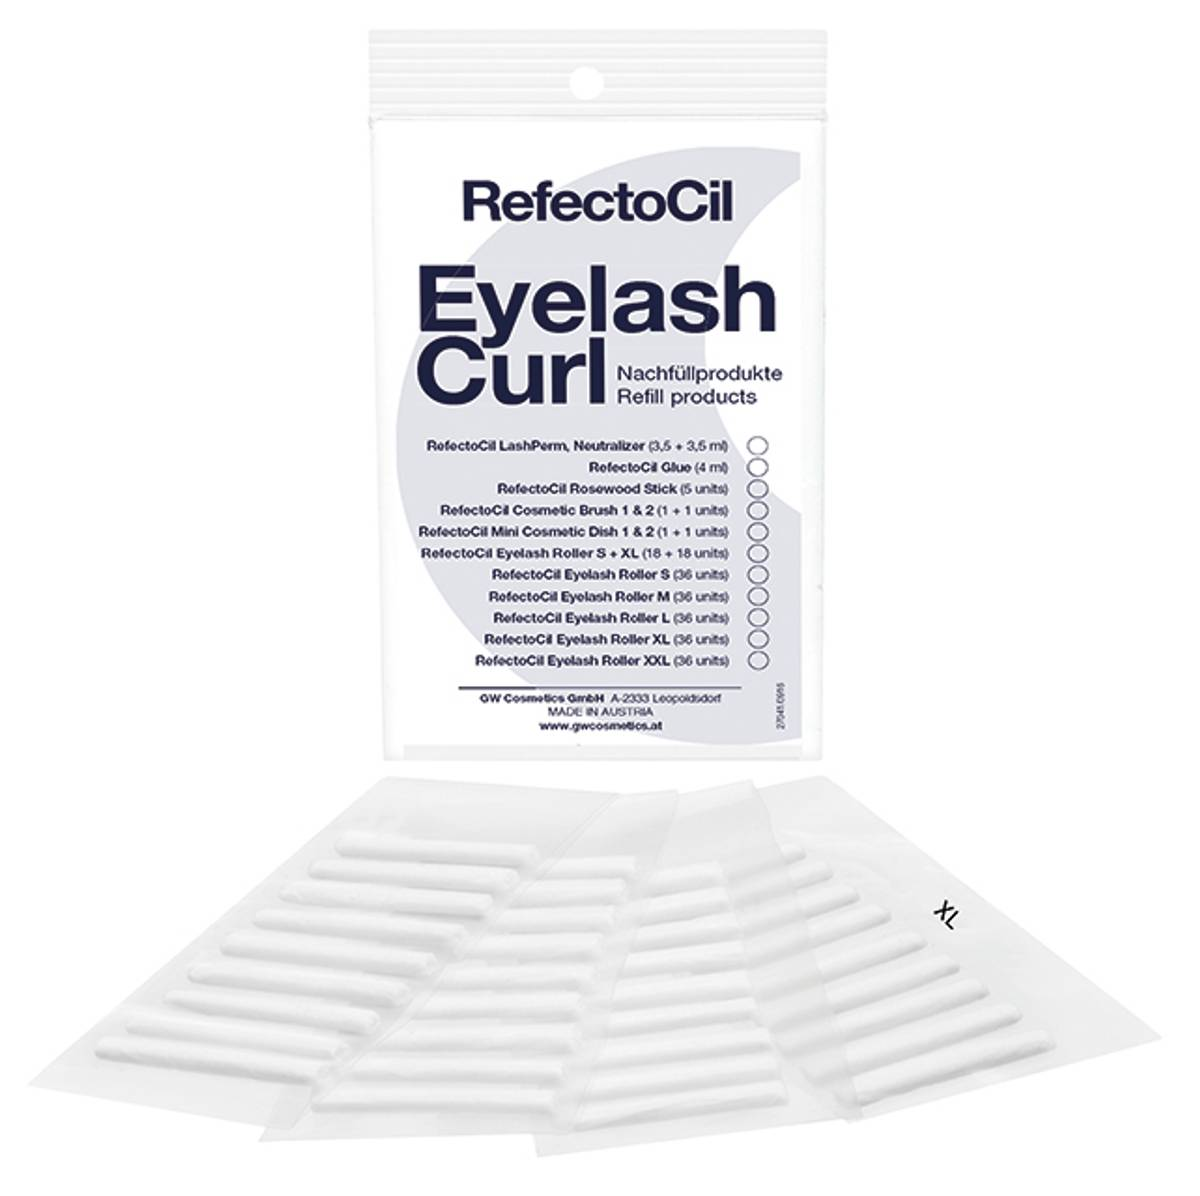 RefectoCil Eyelash Curl Roller refill